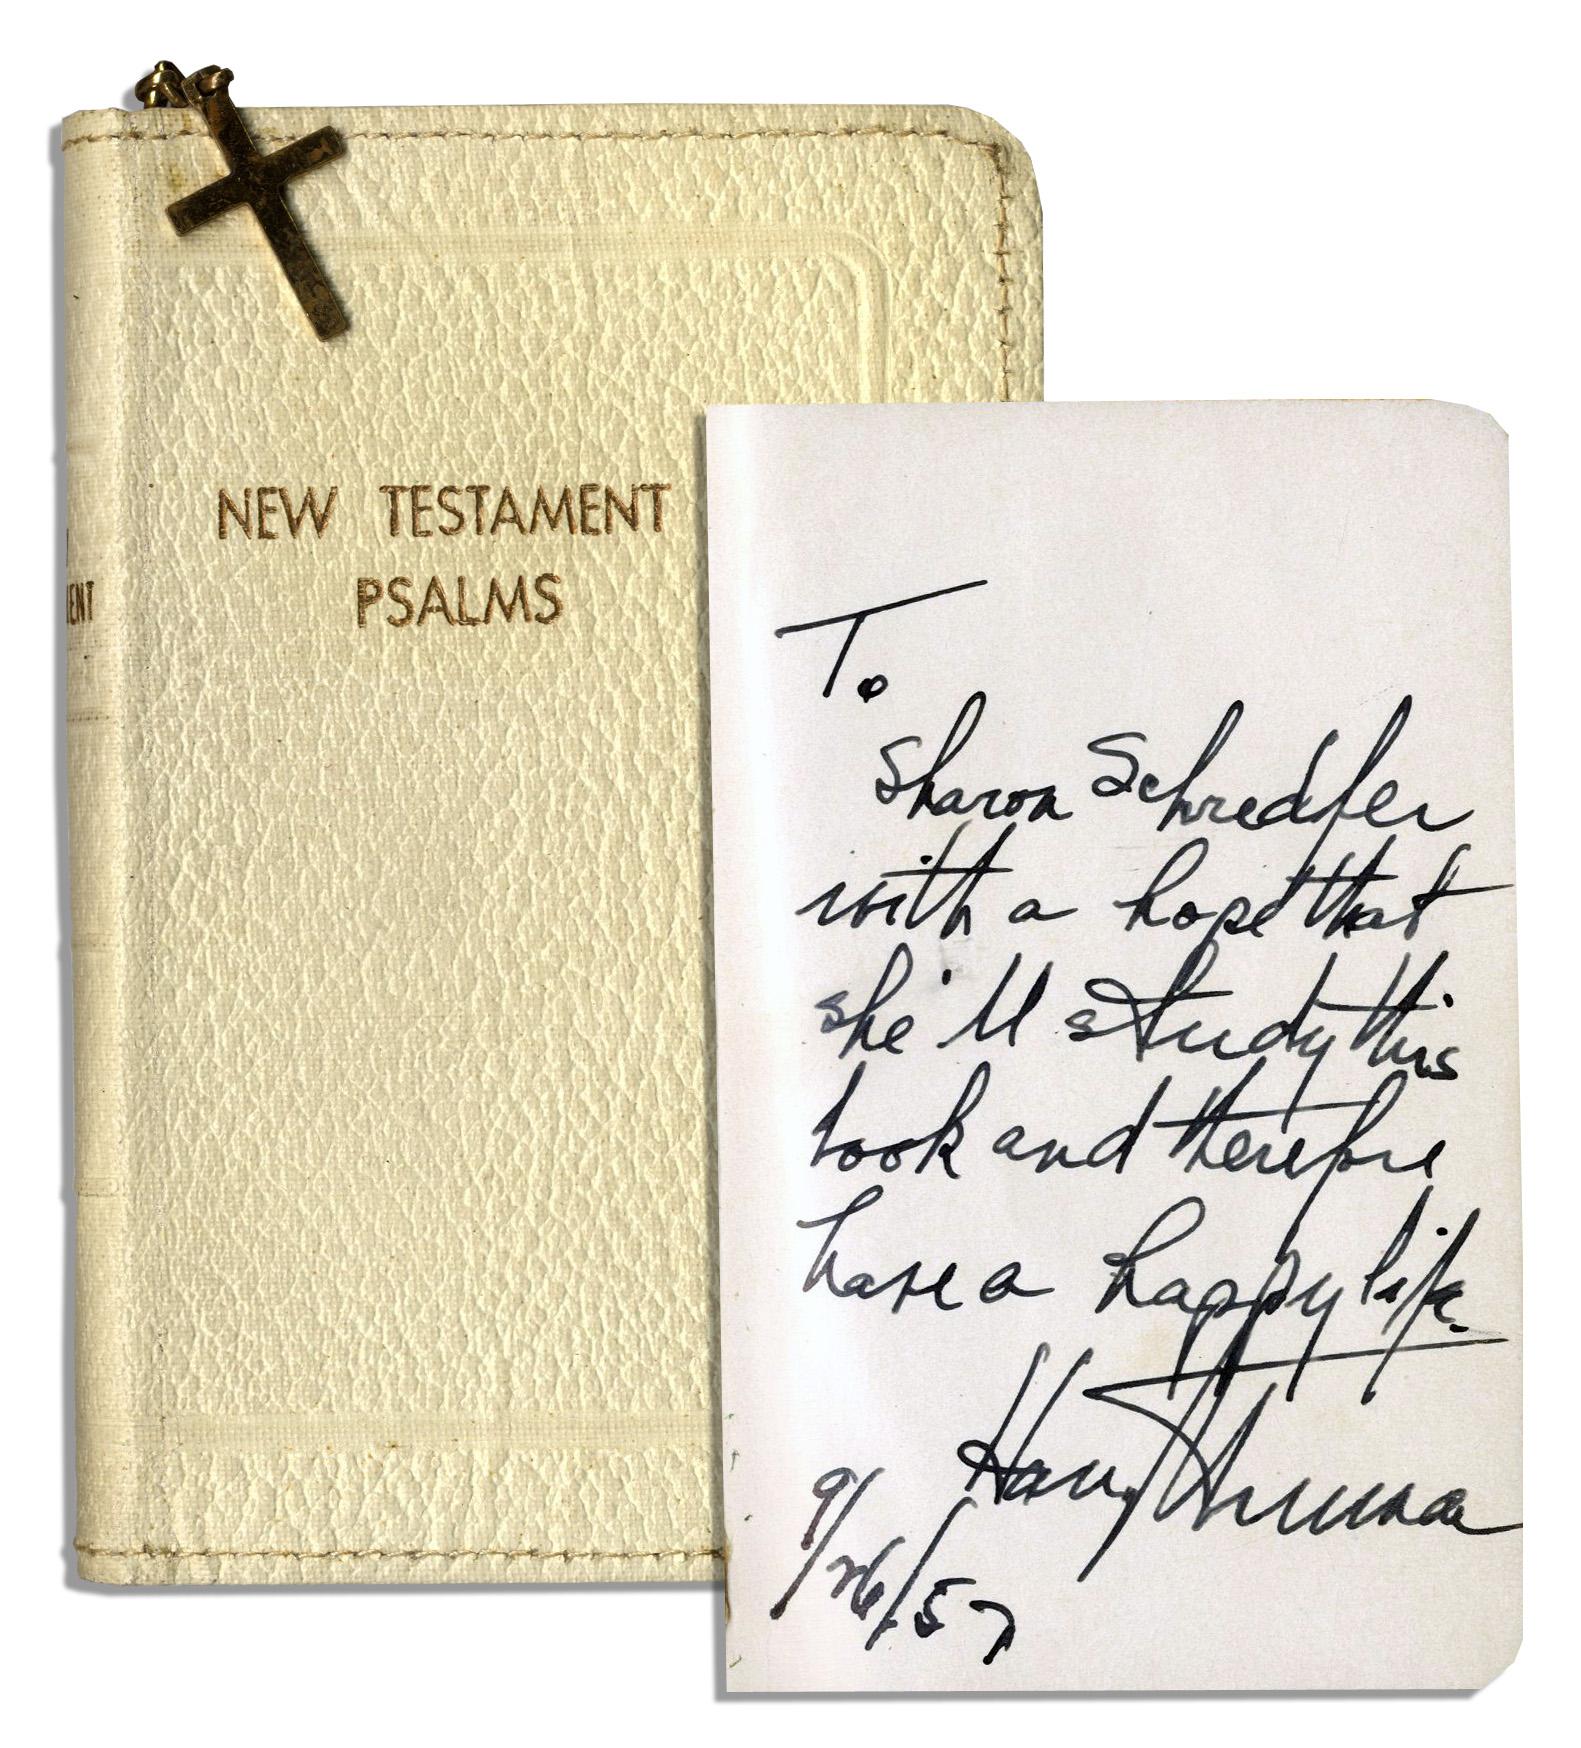 Harry Truman Memorabilia Harry Truman Autograph Note Signed in Bible Book of Psalms -- 1957